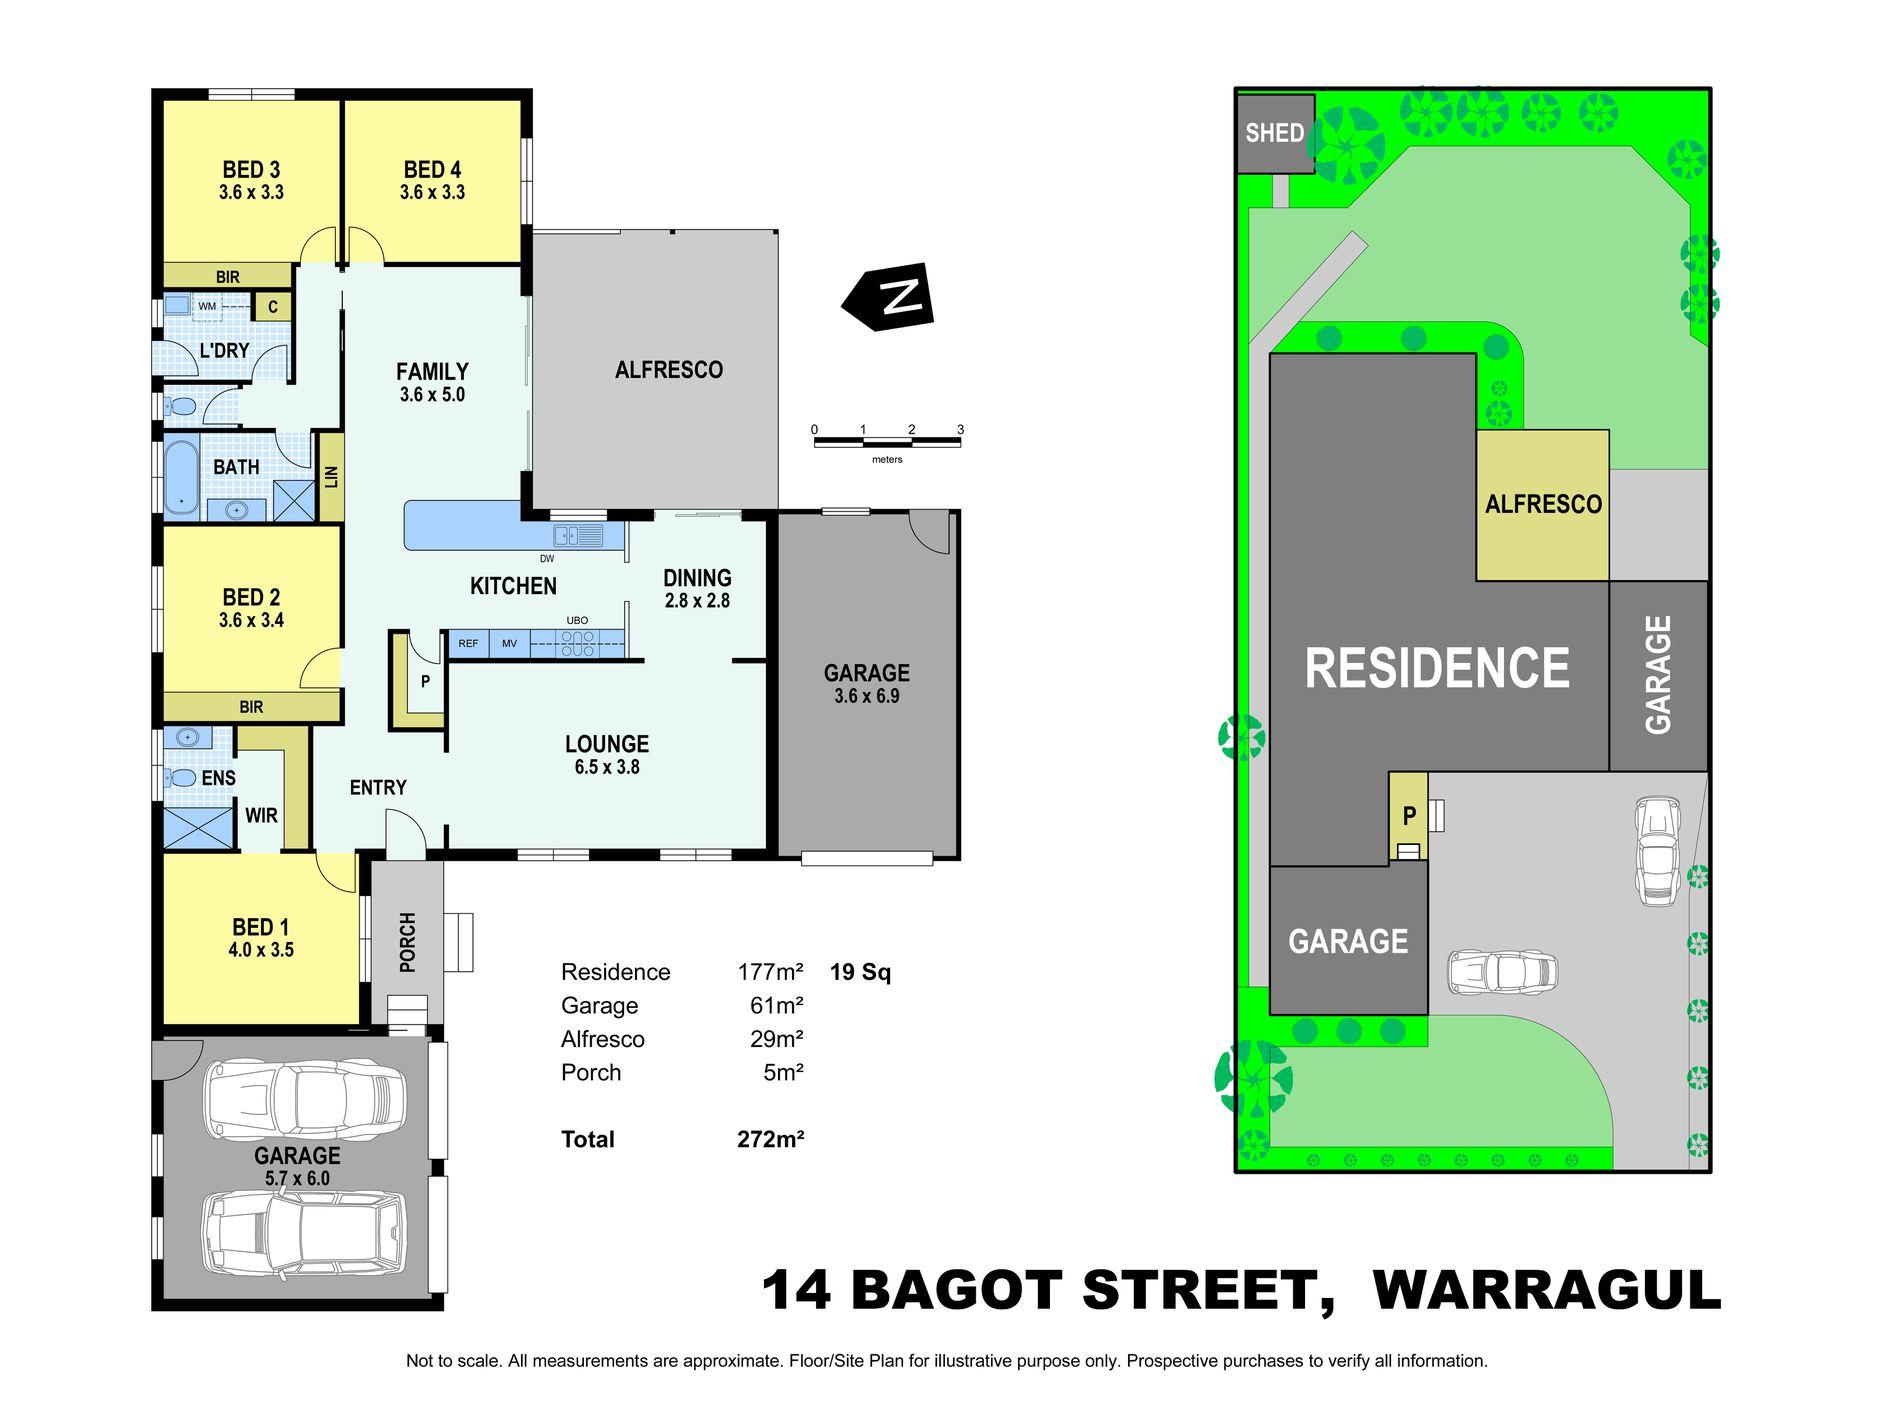 14 Bagot Street, Warragul